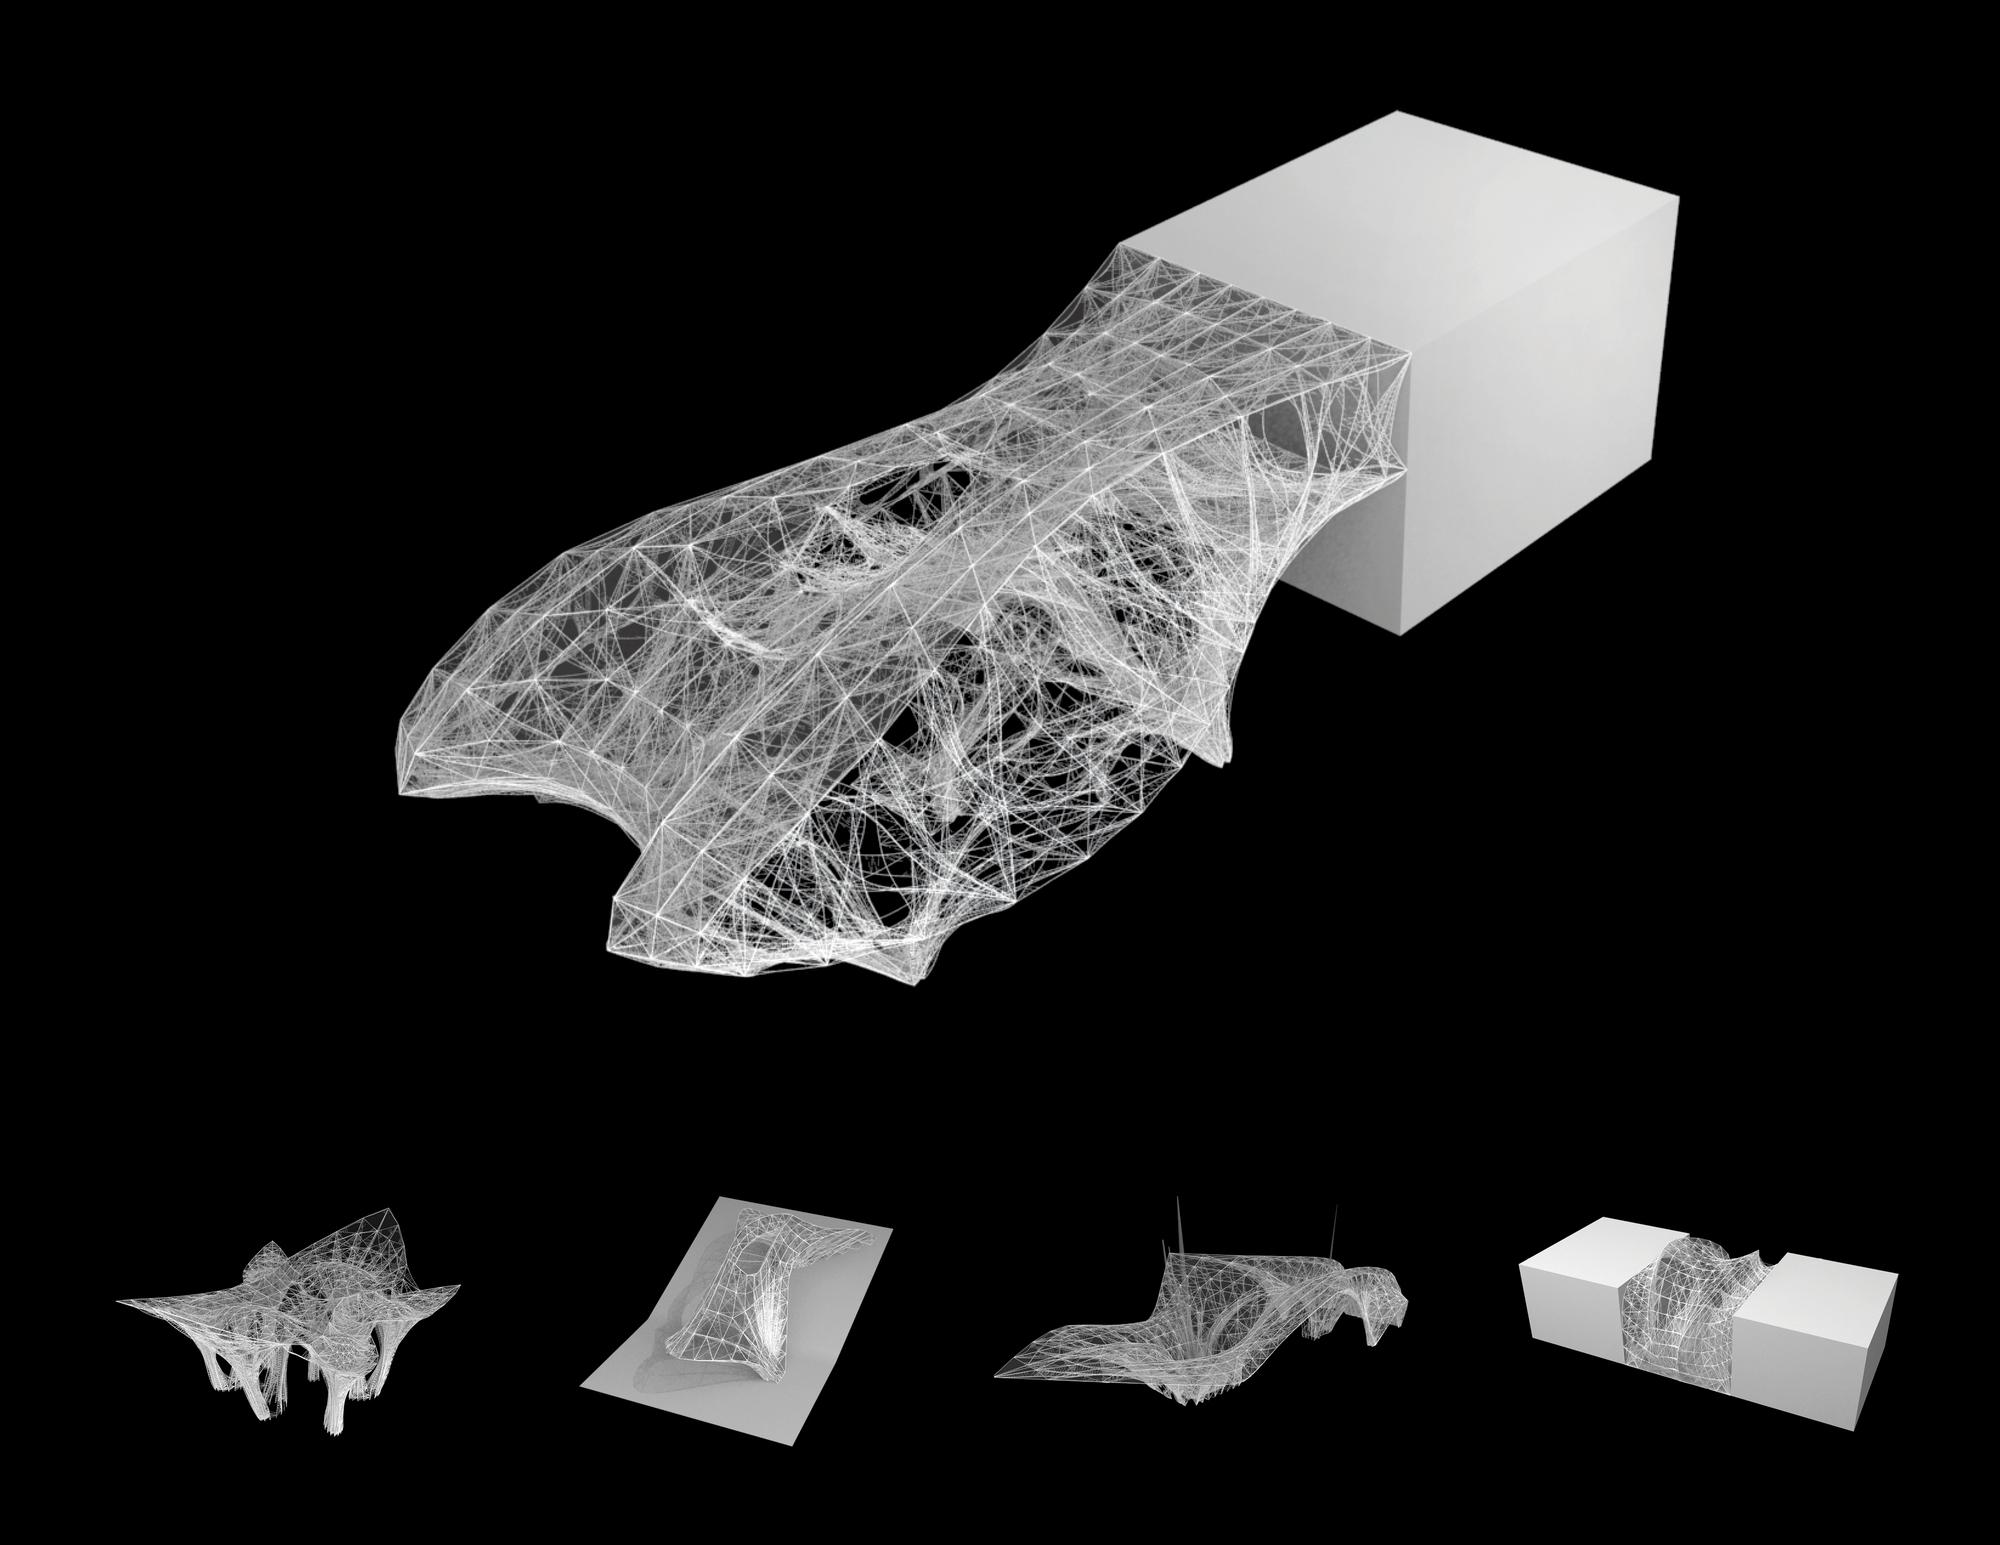 D Printed Architecture Designs